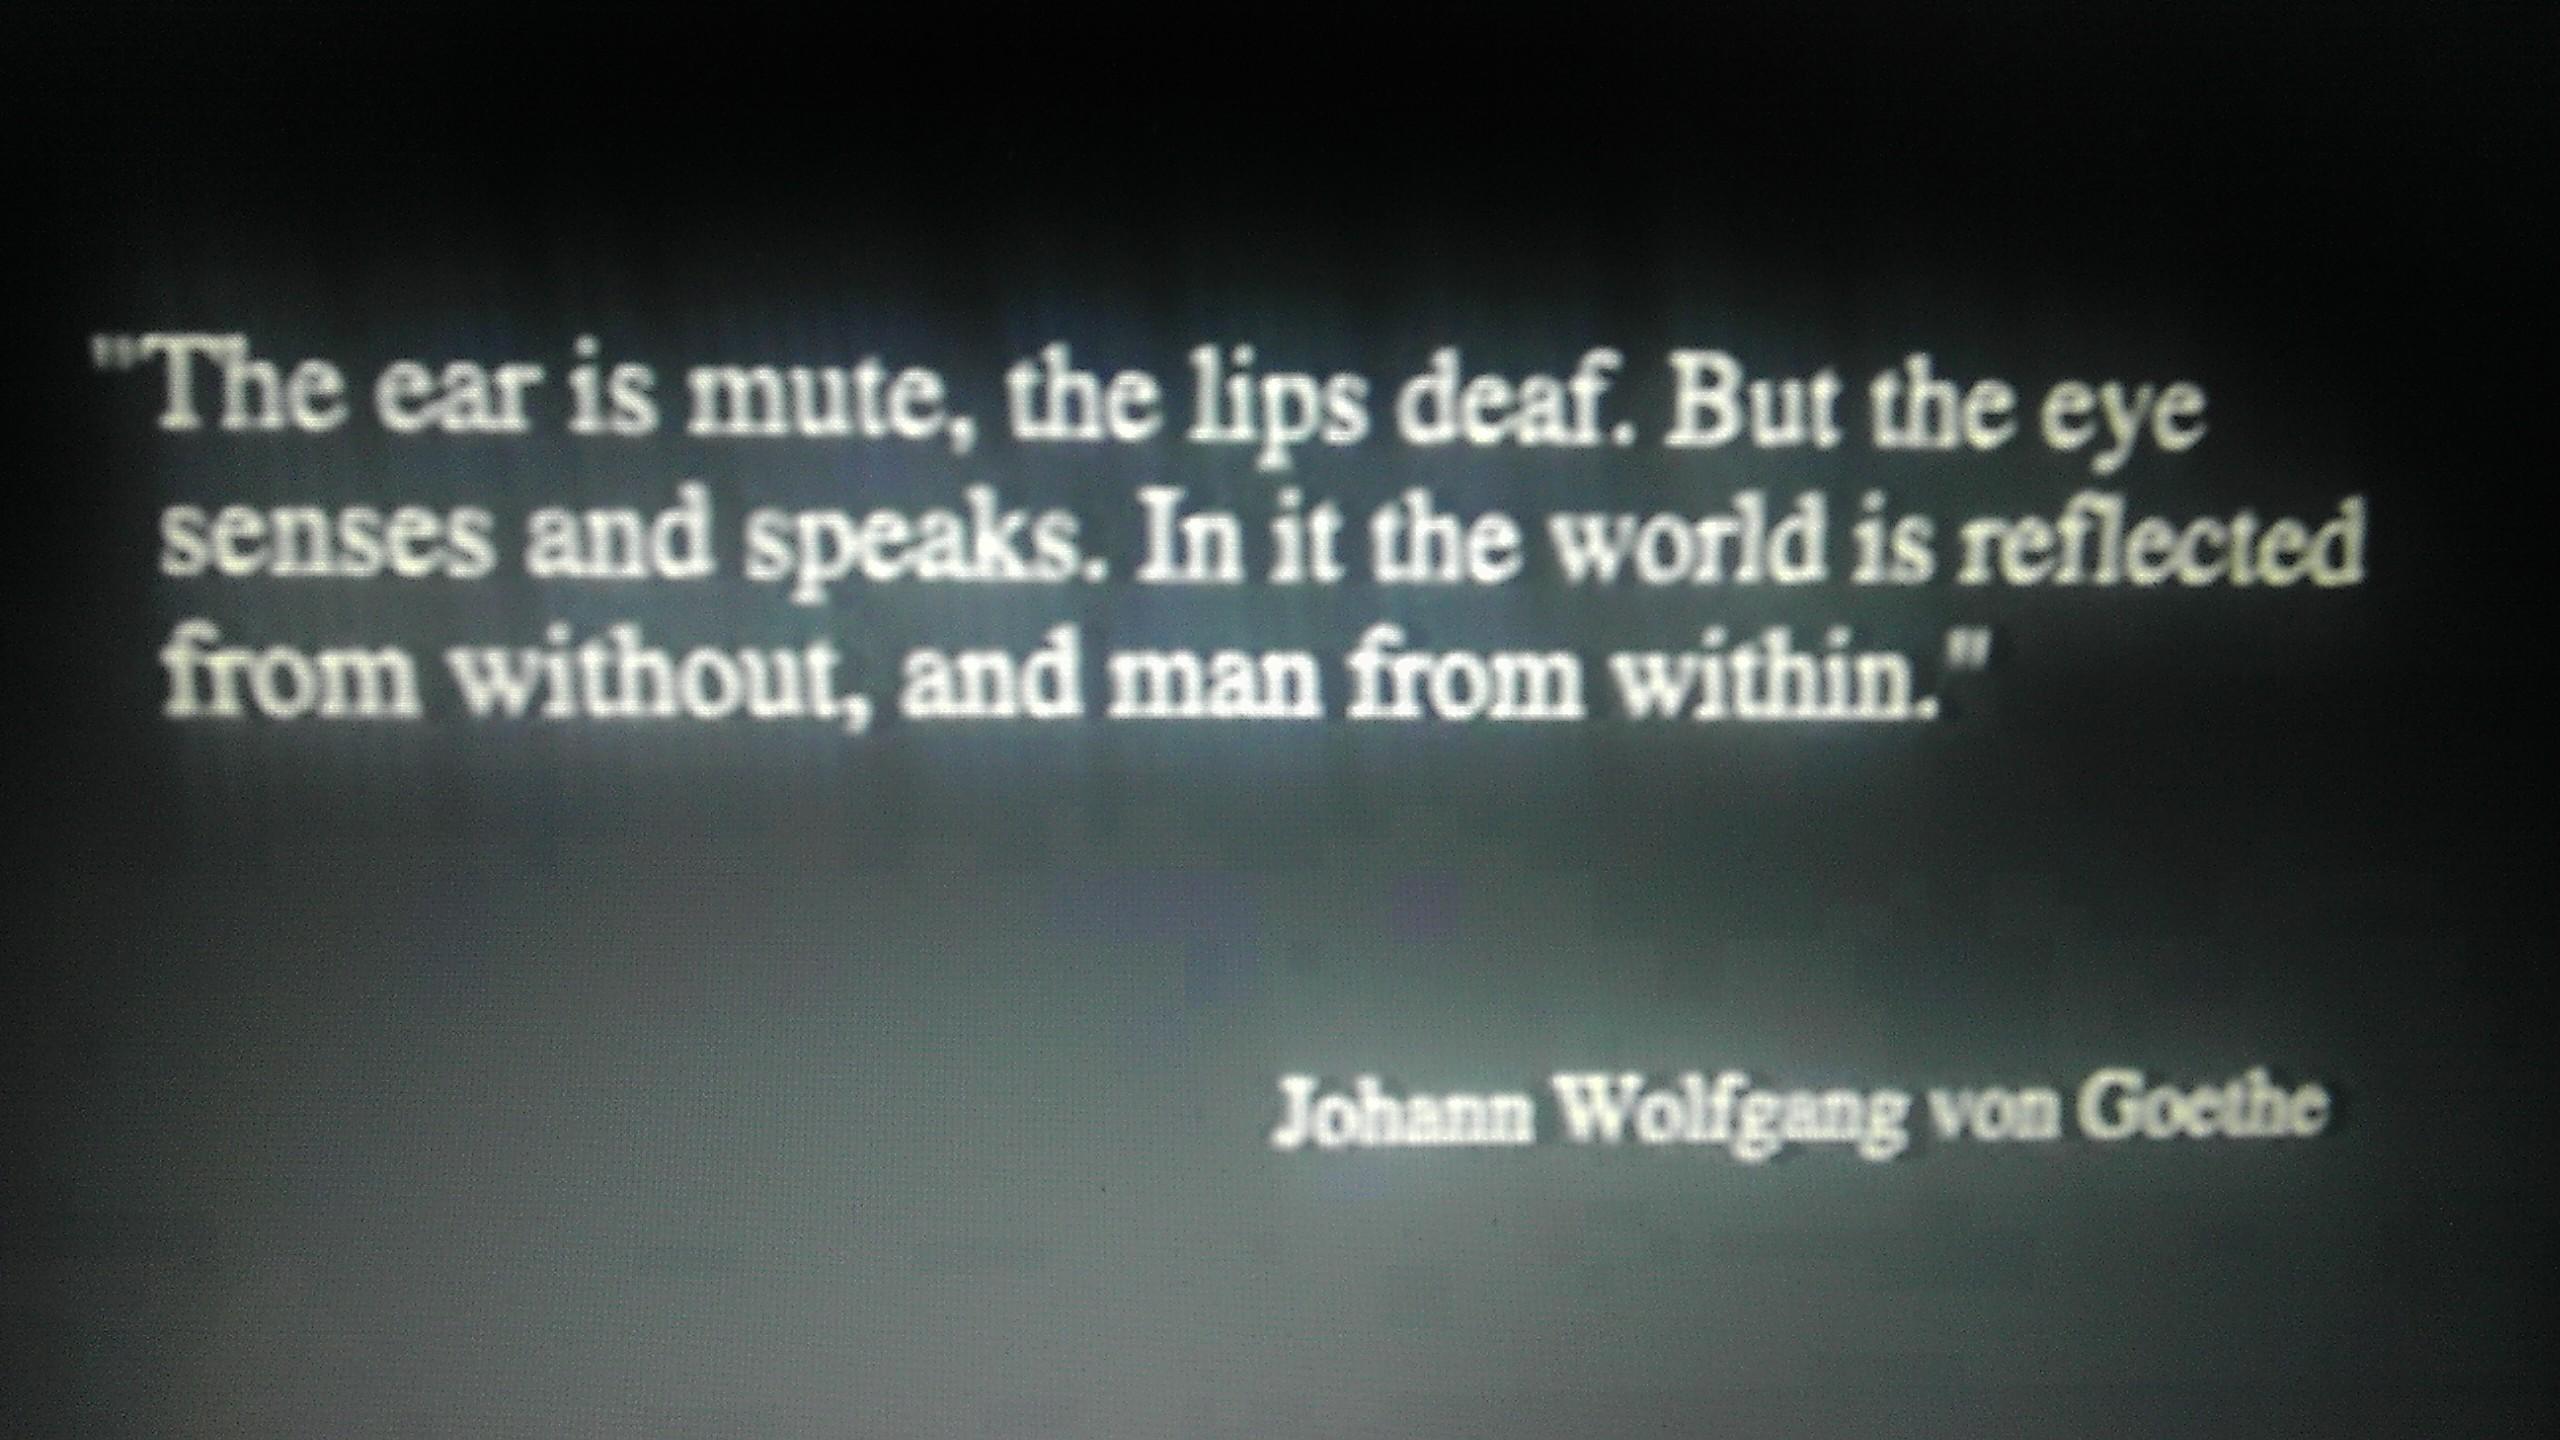 Goethe on seeing